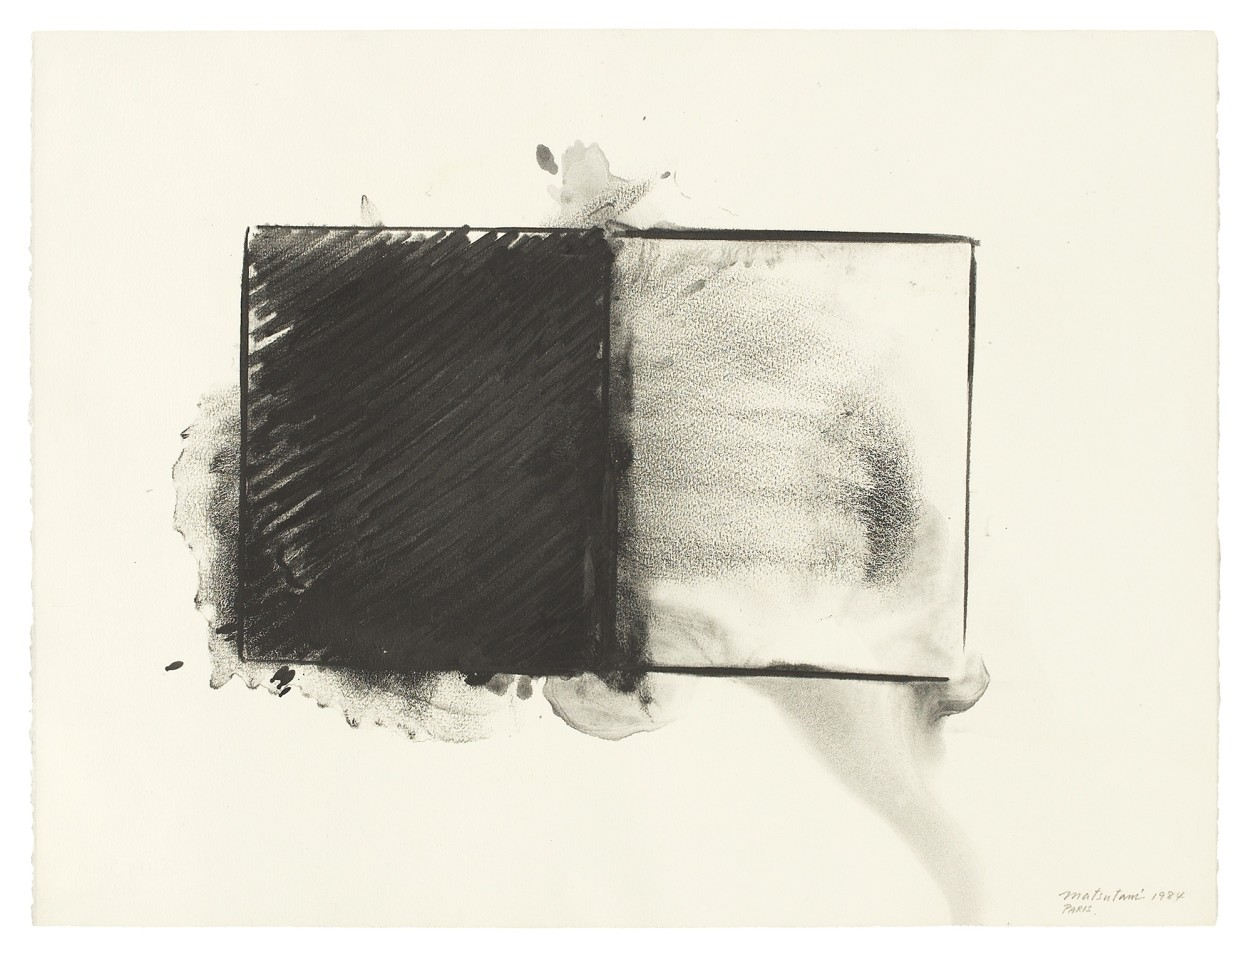 Takesada Matsutani, #003347  Two Rooms, 1984